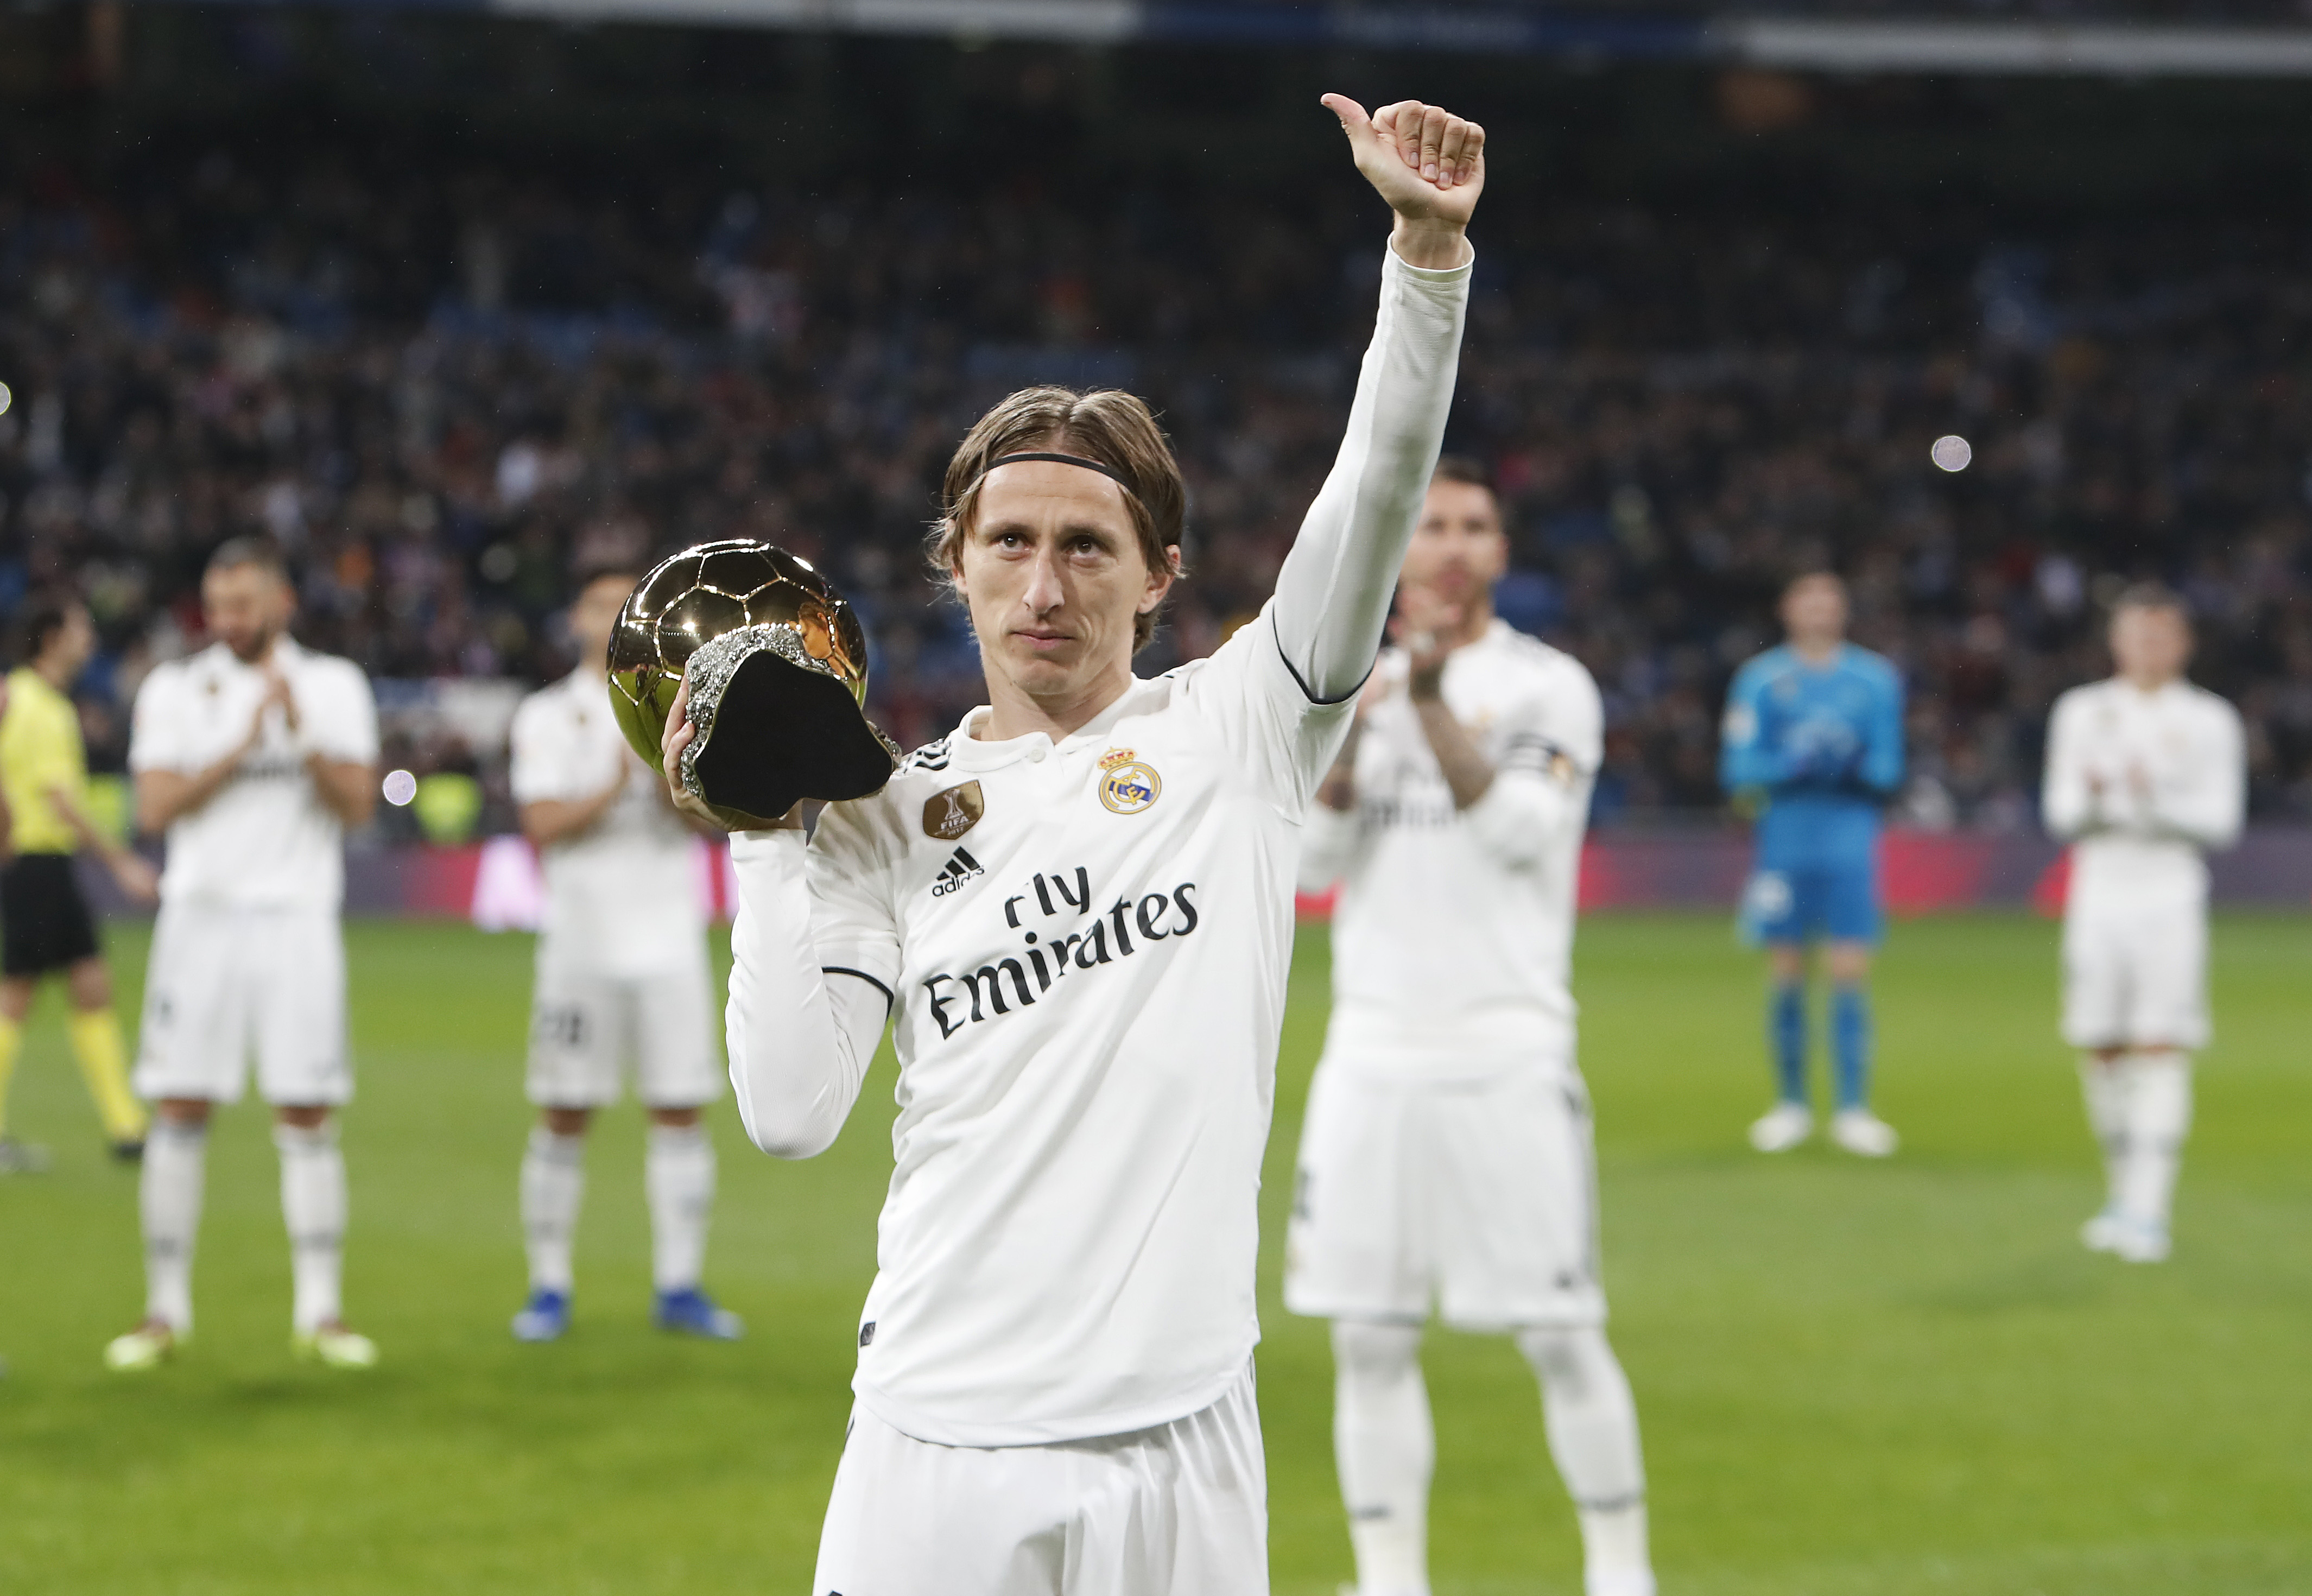 Modric won the 2018 Ballon d'Or